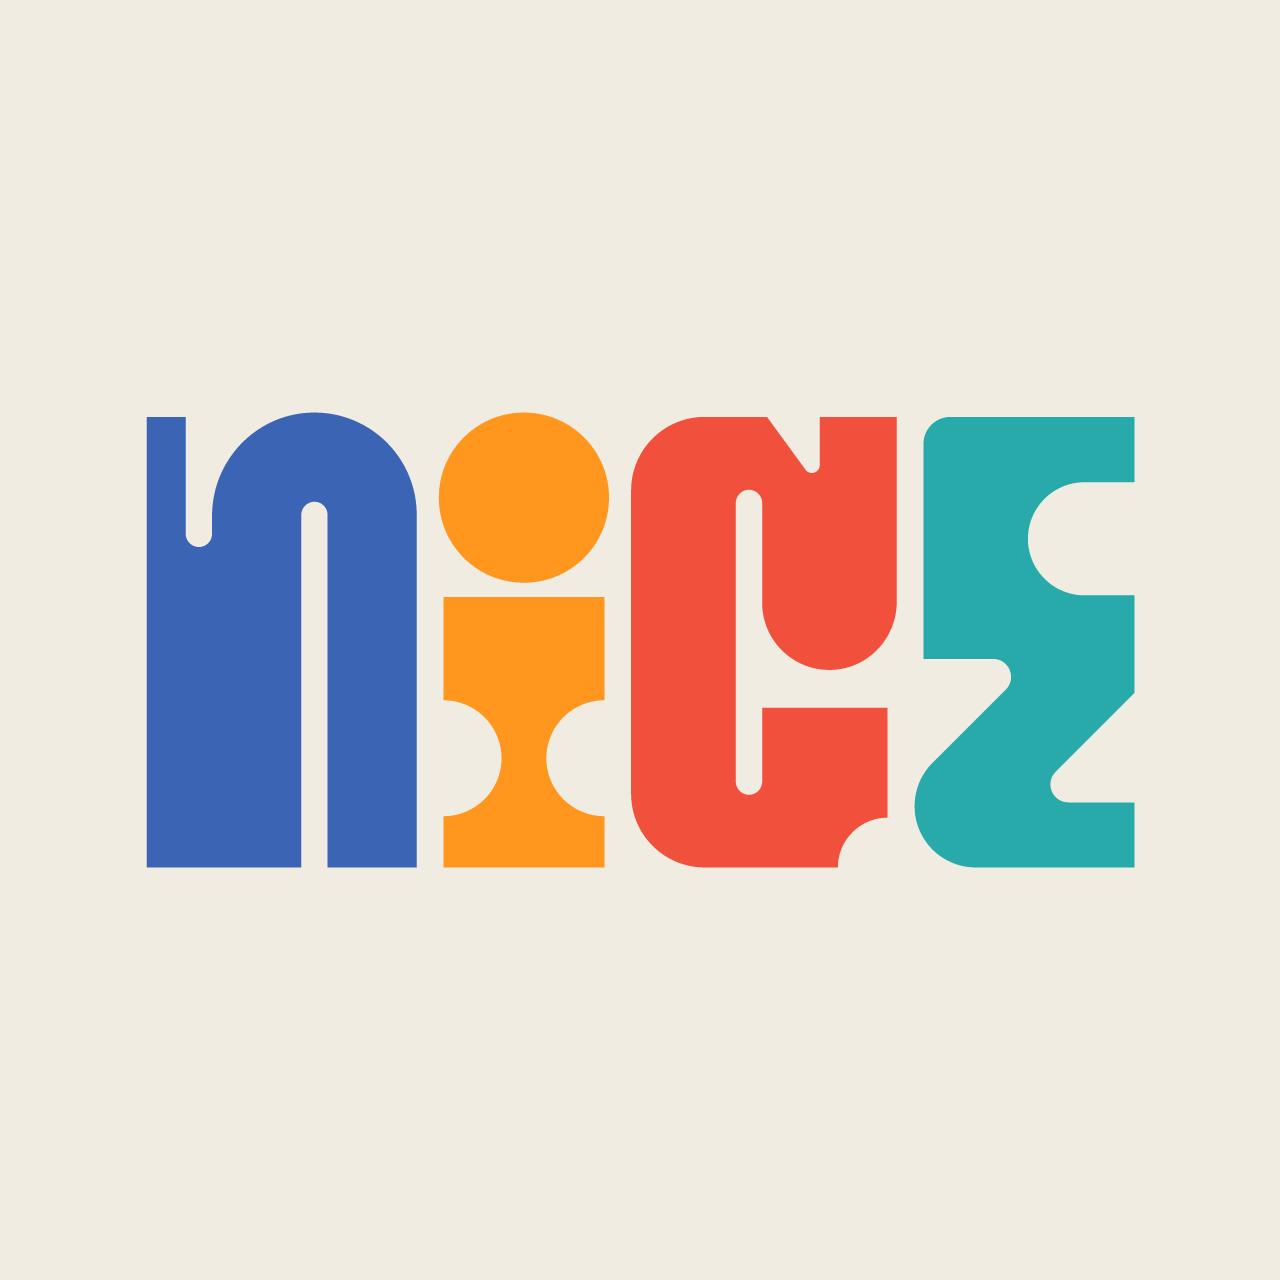 Graphic Design,Typography,Illustration